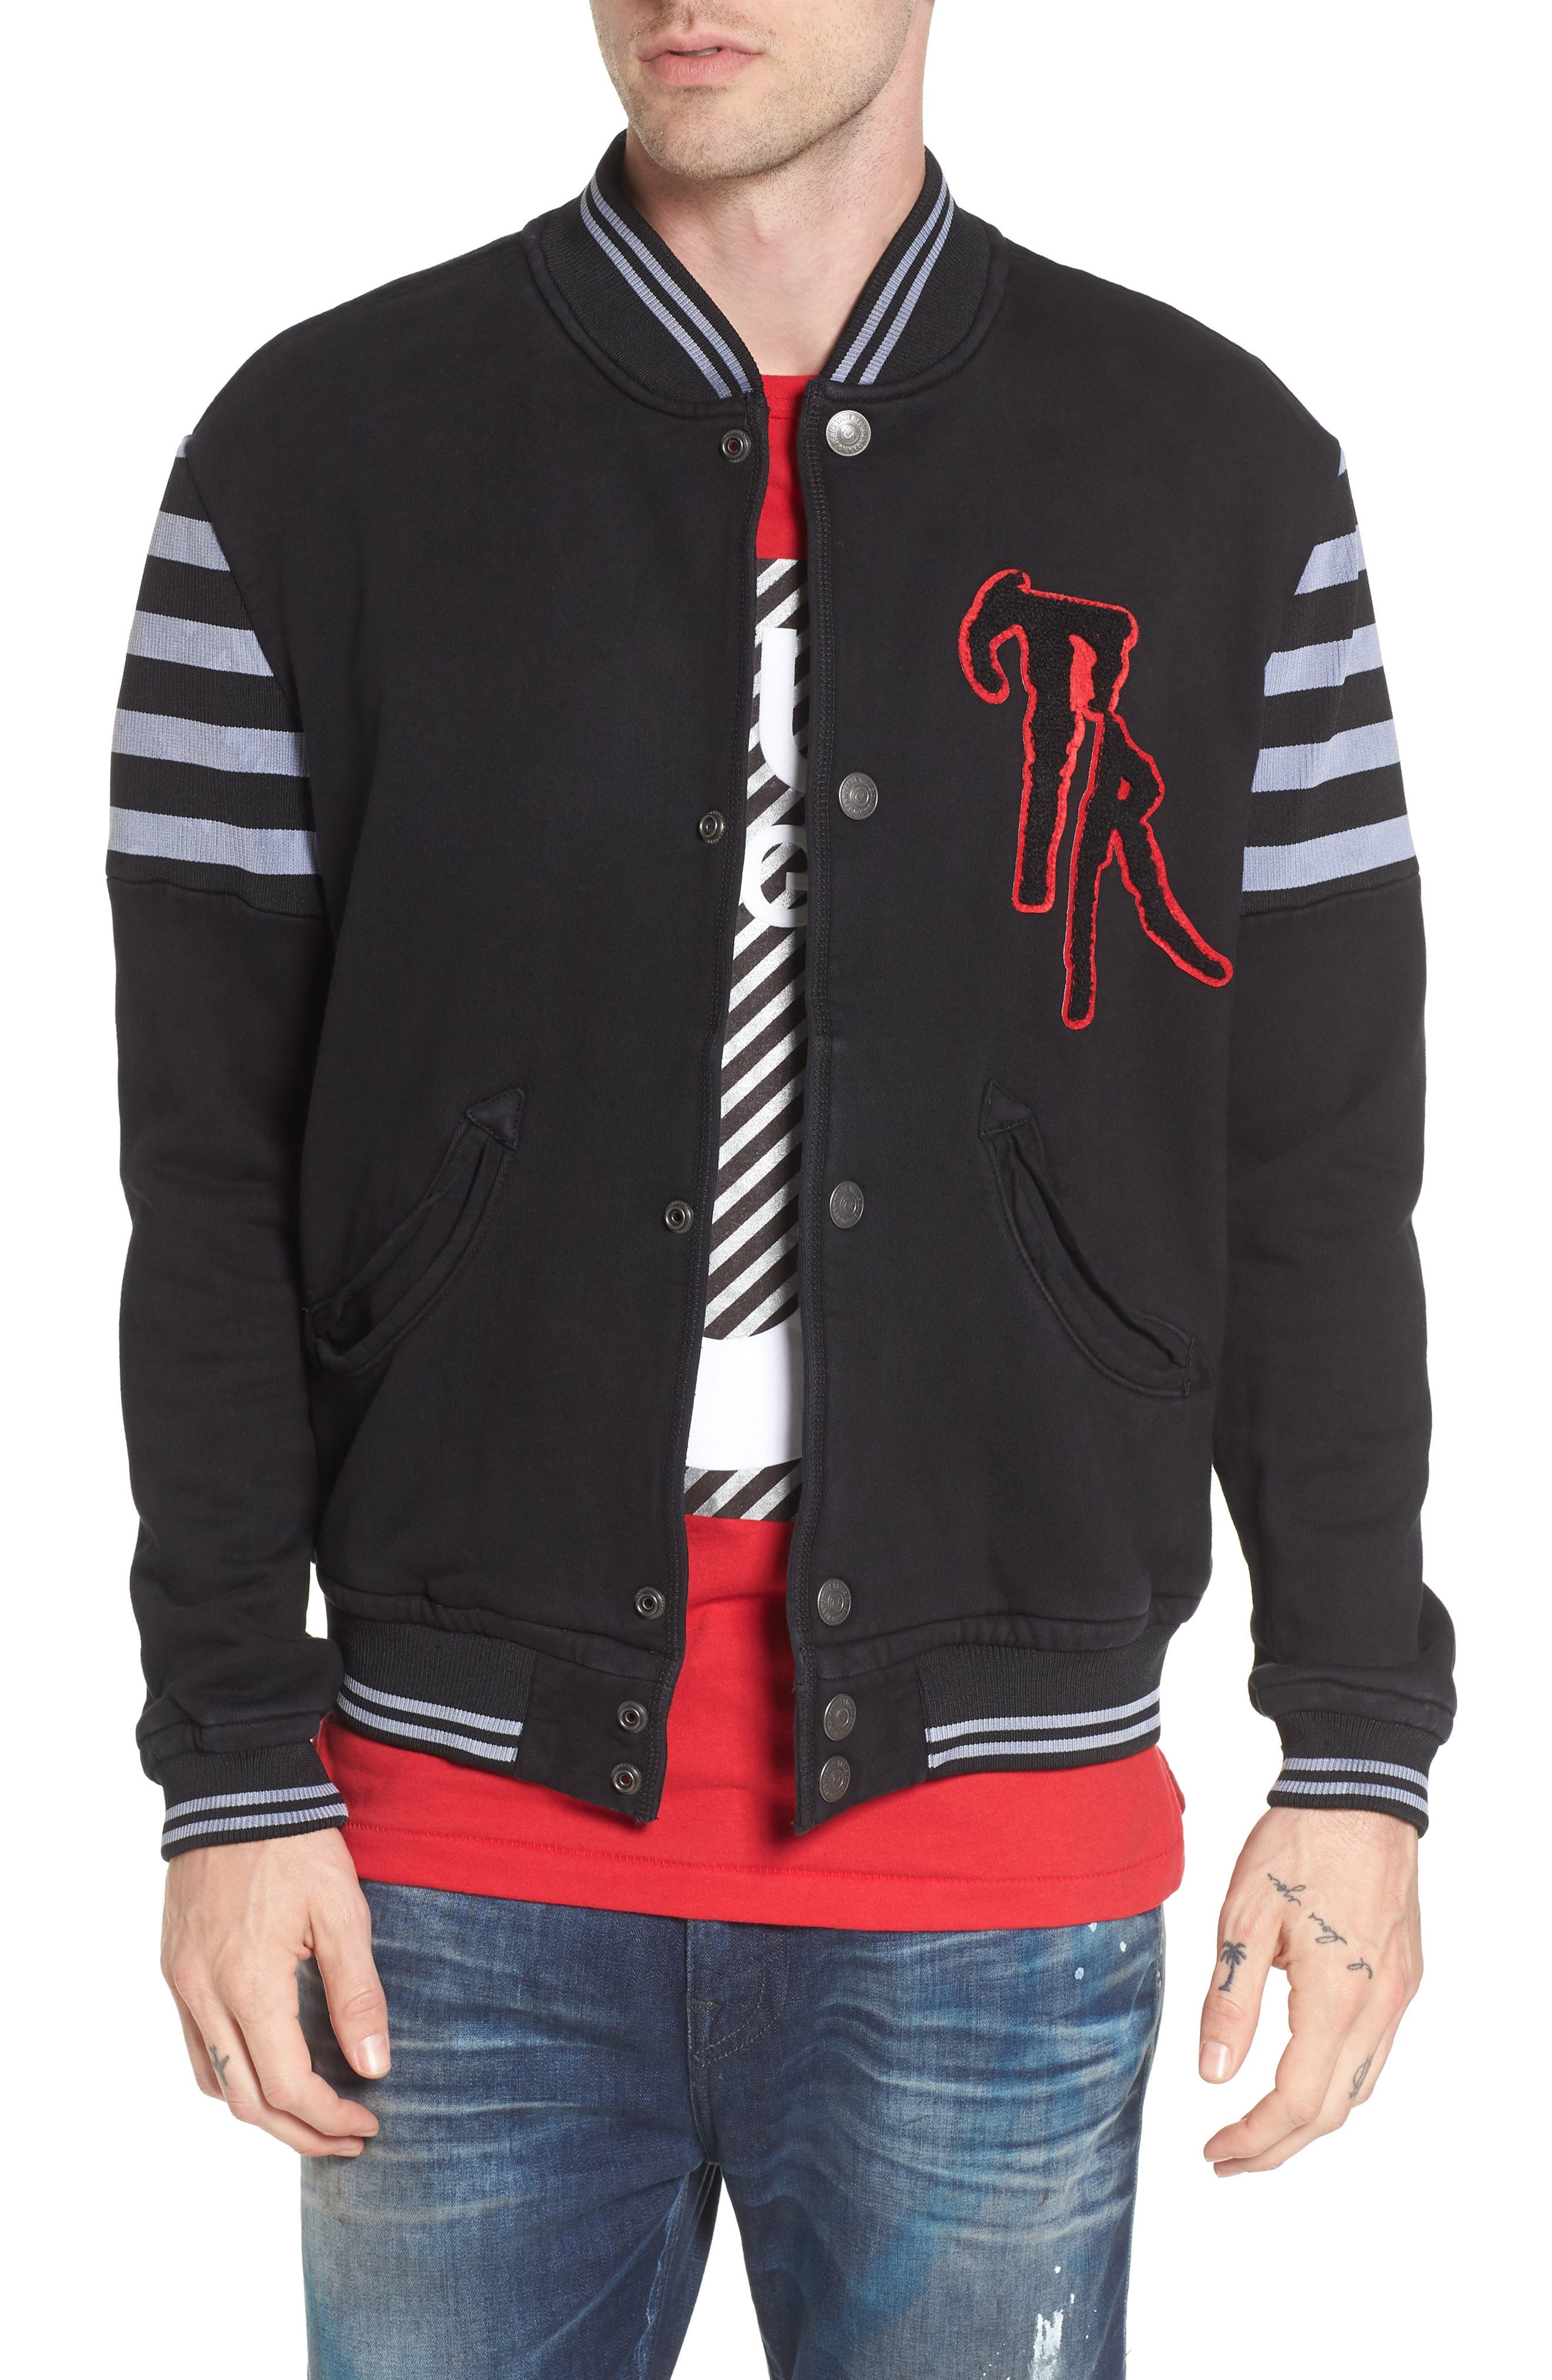 True Religion Brand Jeans Collegiate Knit Inset Jacket